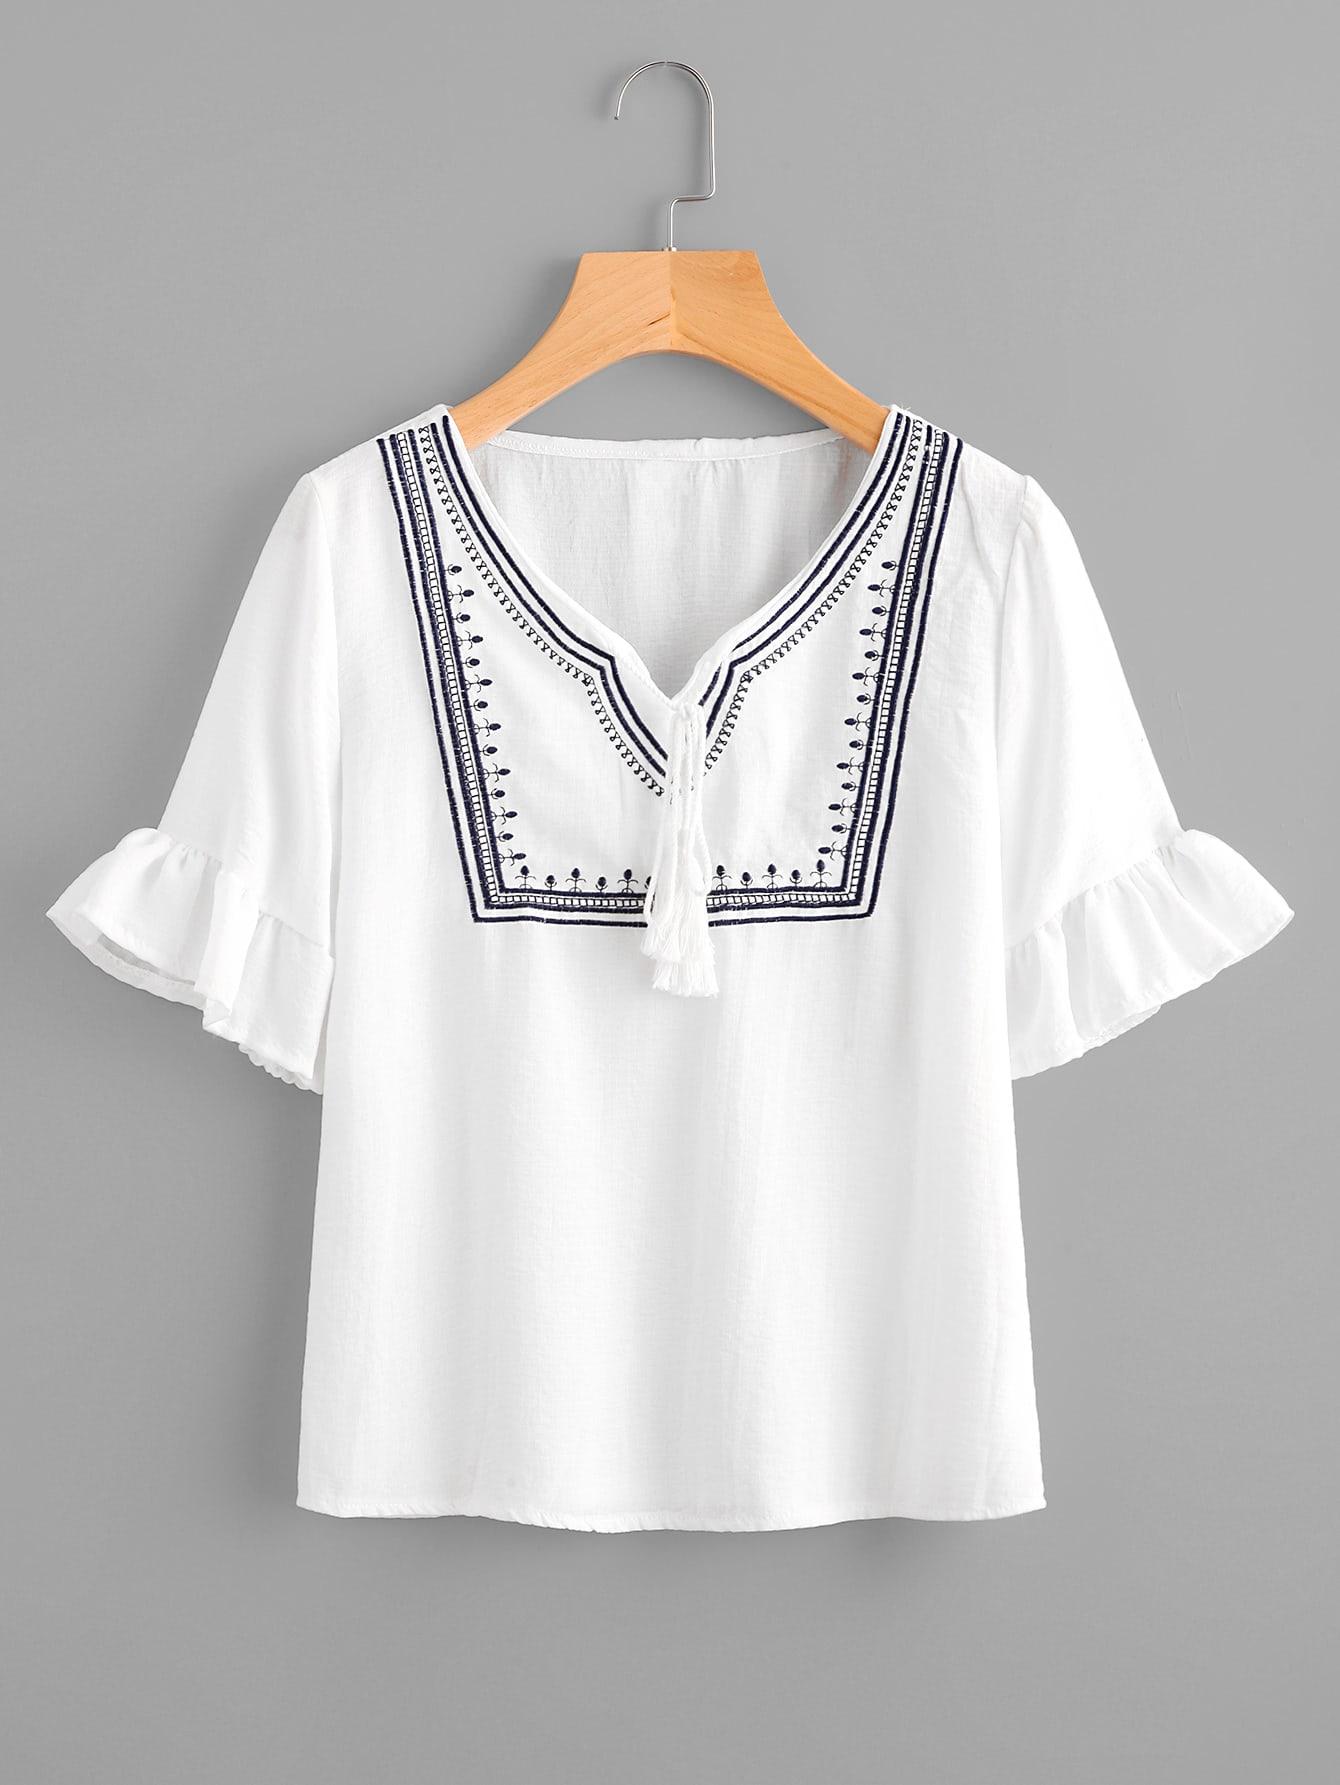 Фото Tassel Tie Neck Frill Cuff Embroidery Blouse. Купить с доставкой